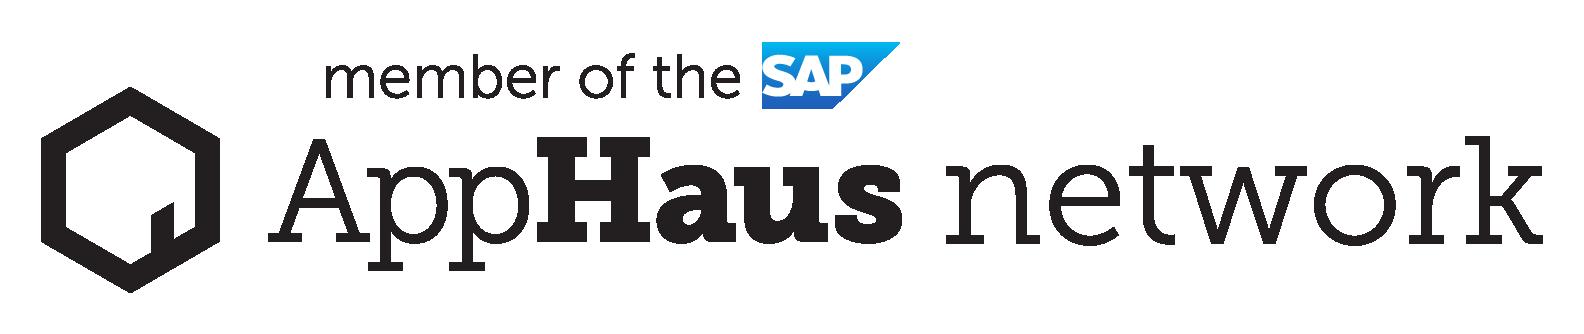 SAP AppHaus Calgary